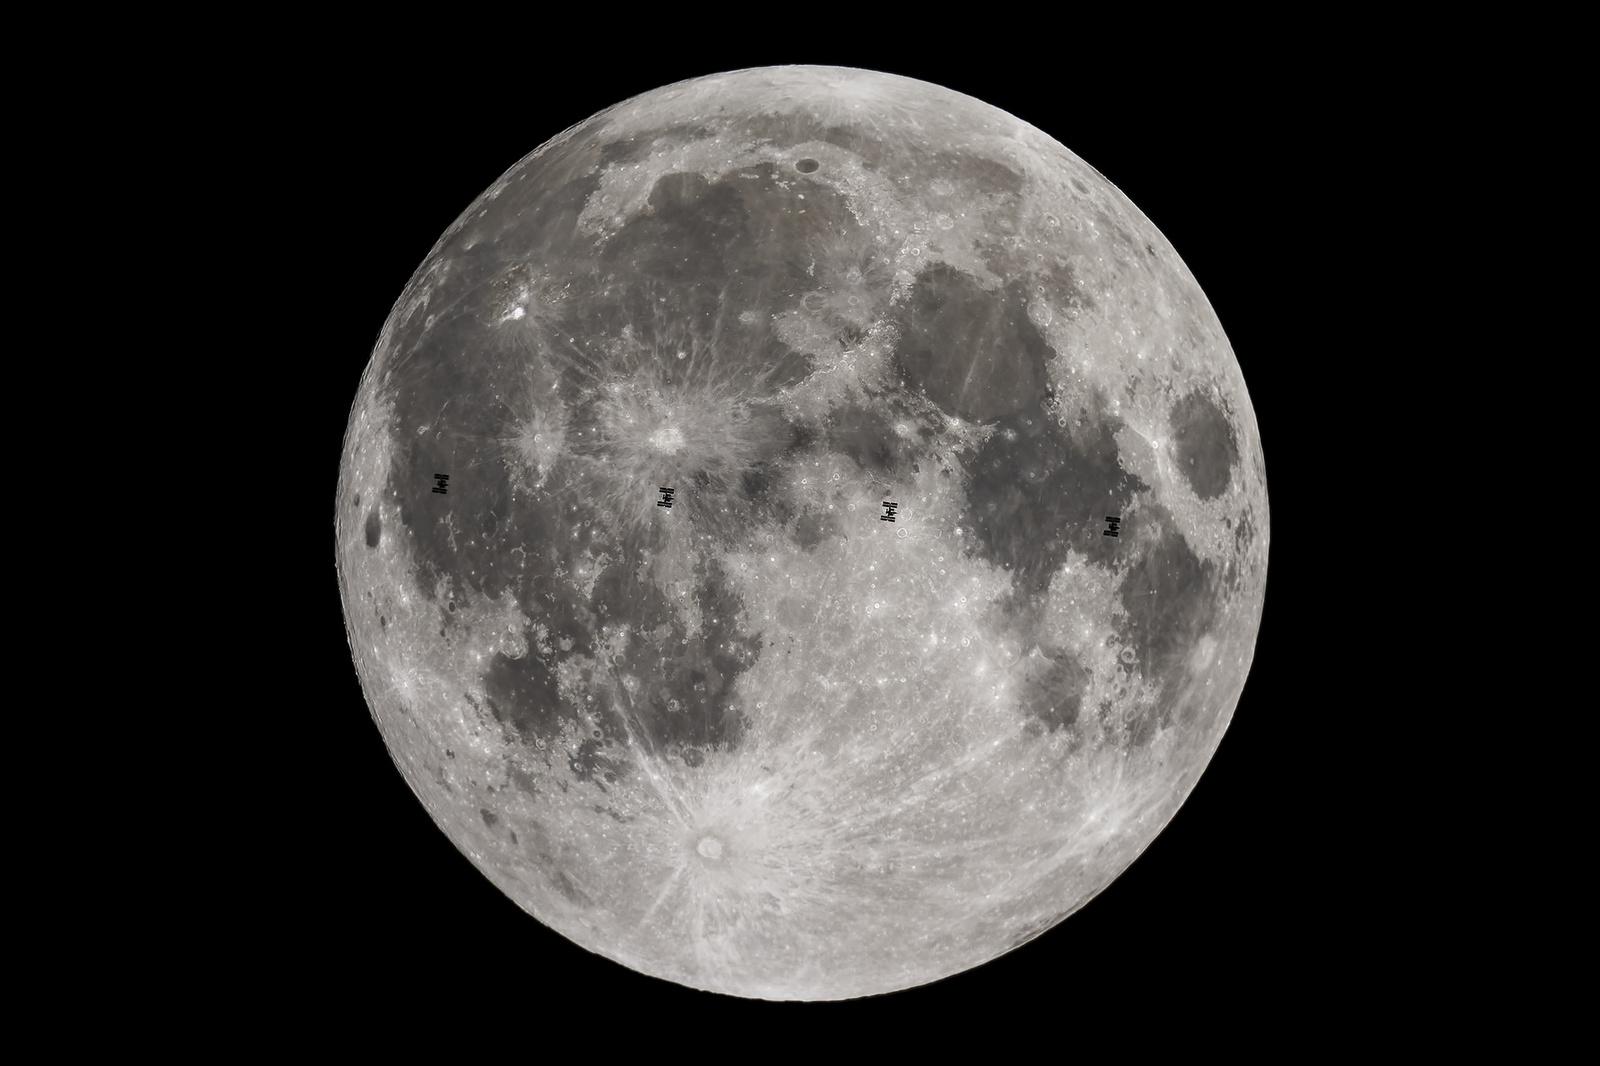 ISS_Moon_mz.thumb.jpg.40ee31ec72049f64f18d2ce32a73374e.jpg